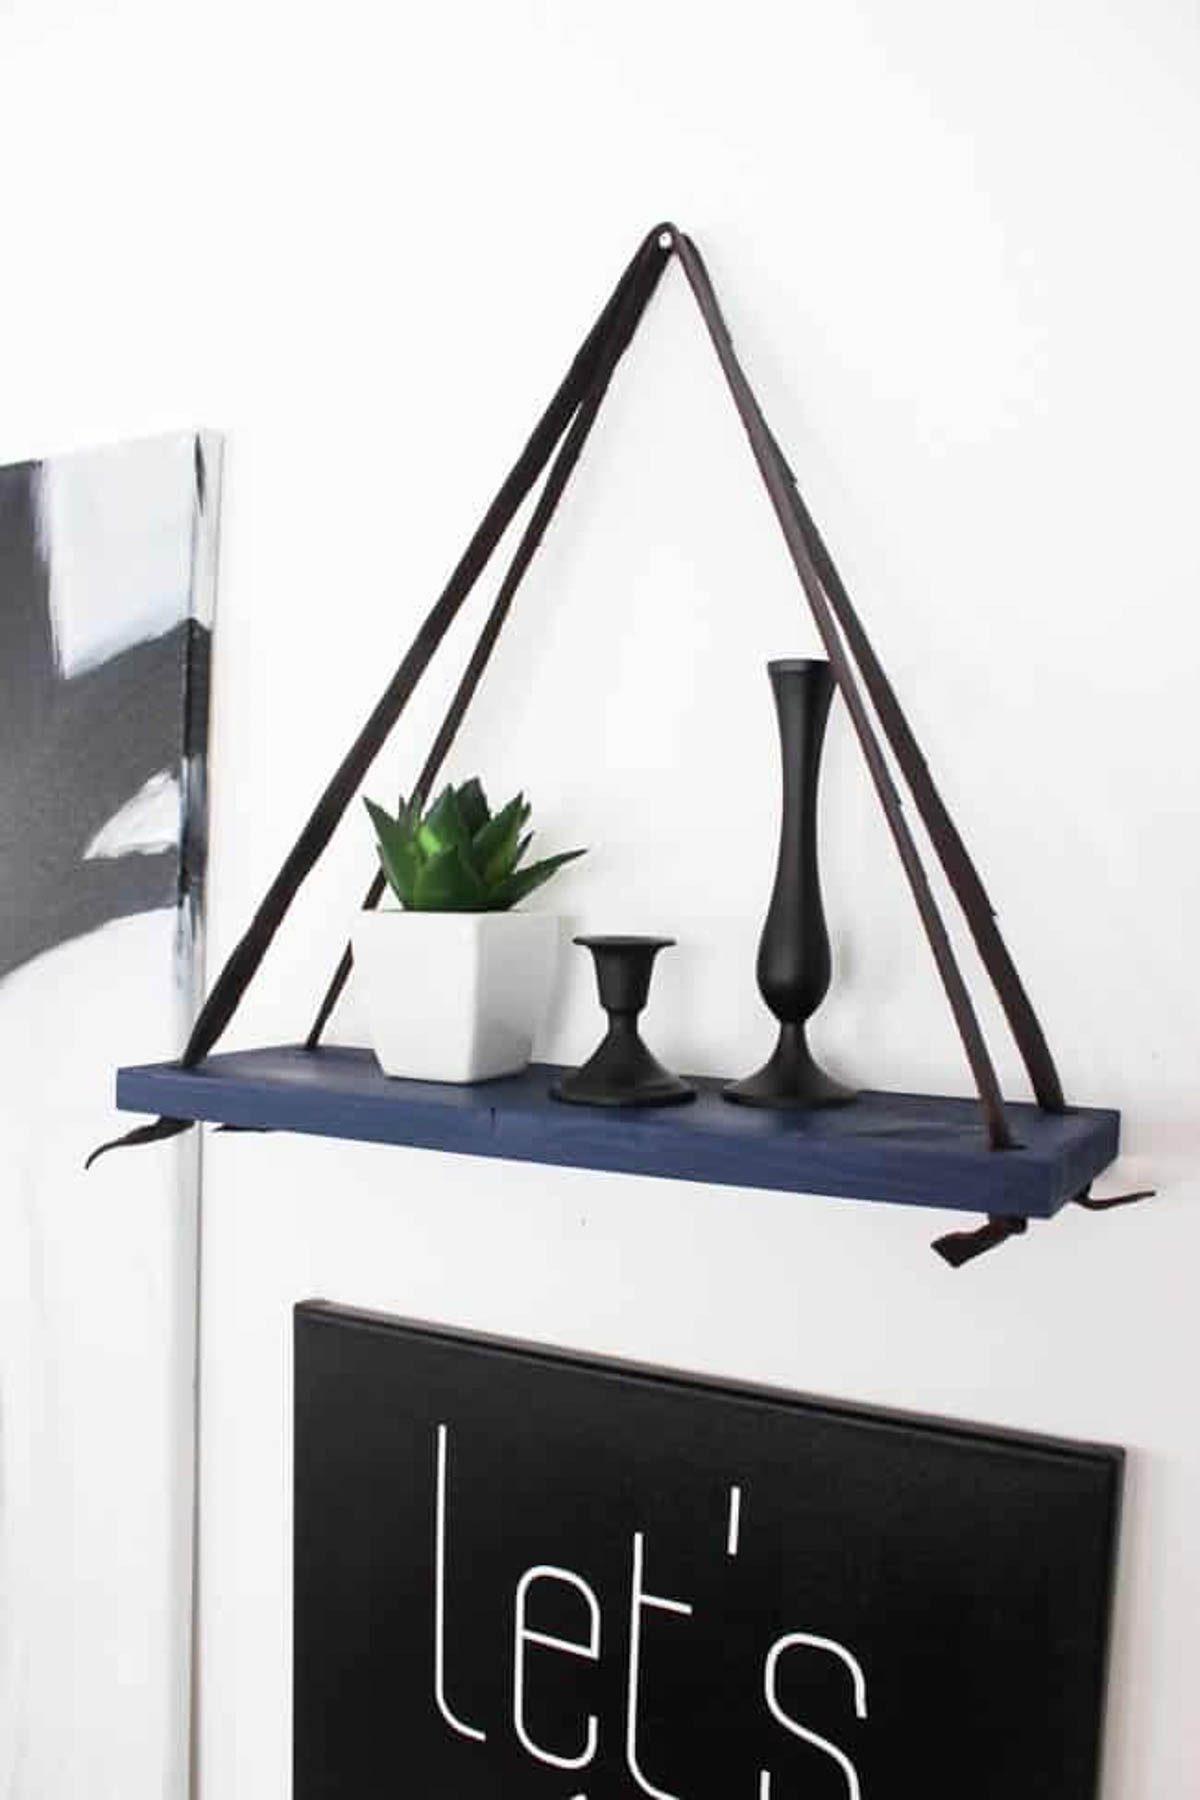 Image of a DIY hanging shelf